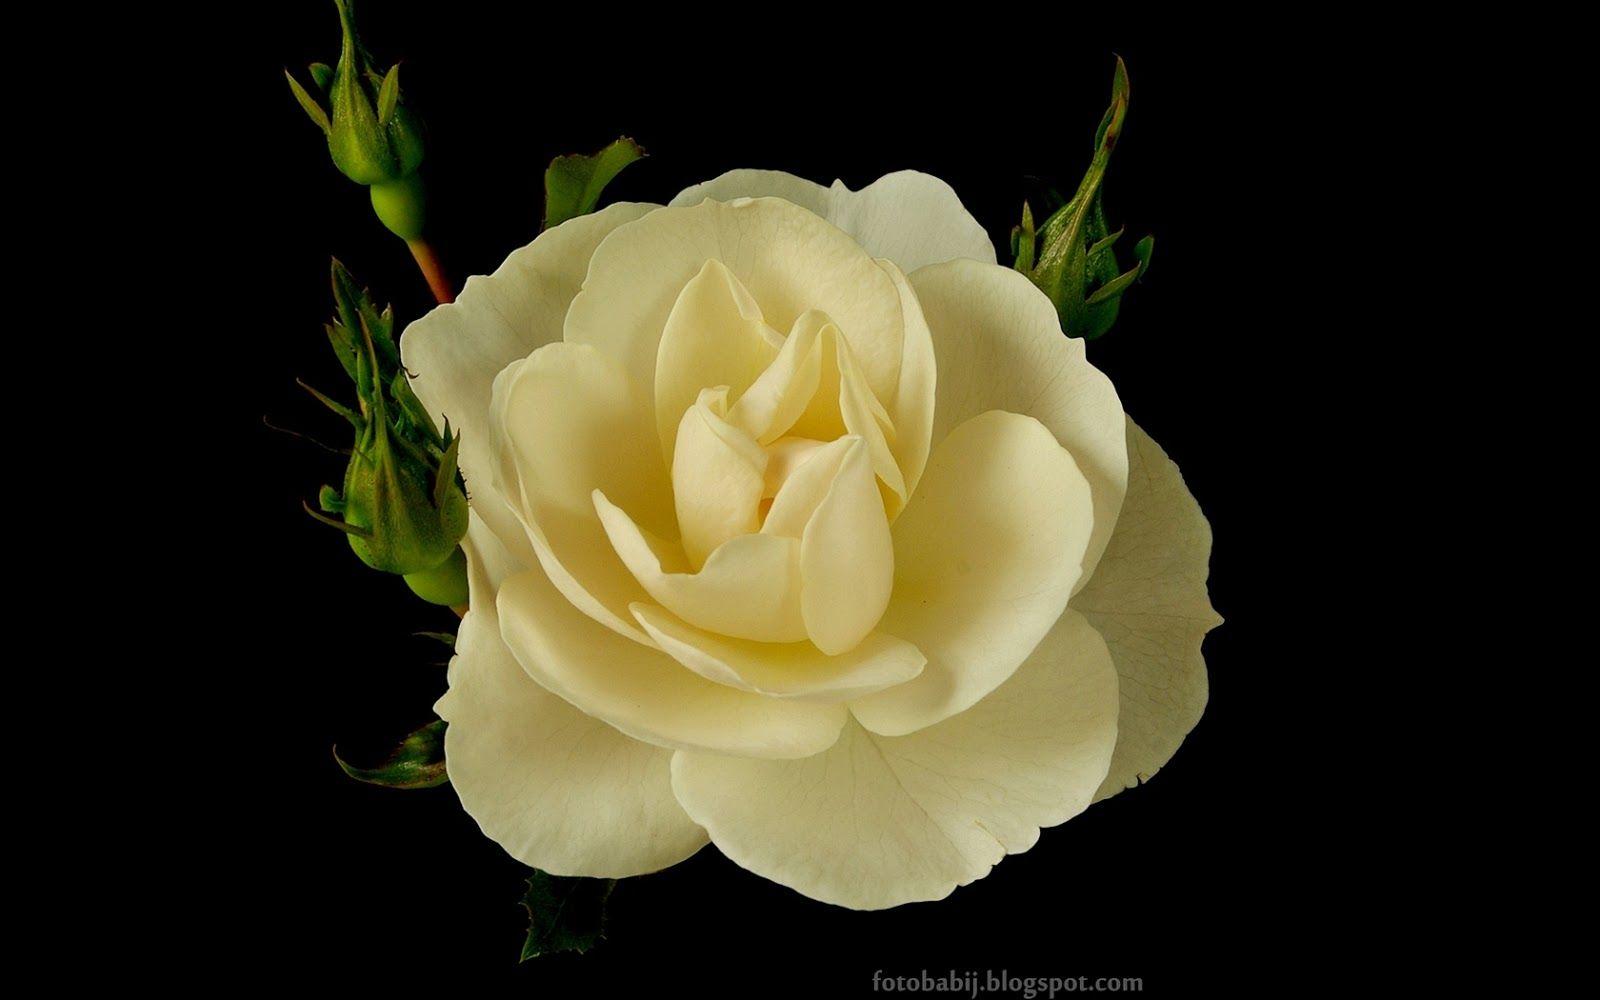 Tapety Na Pulpit 4k Ultra Hd Full Hd I Inne Rozdzielczosci Roza Diamond Border Rose Flowers Rose Flower Garden